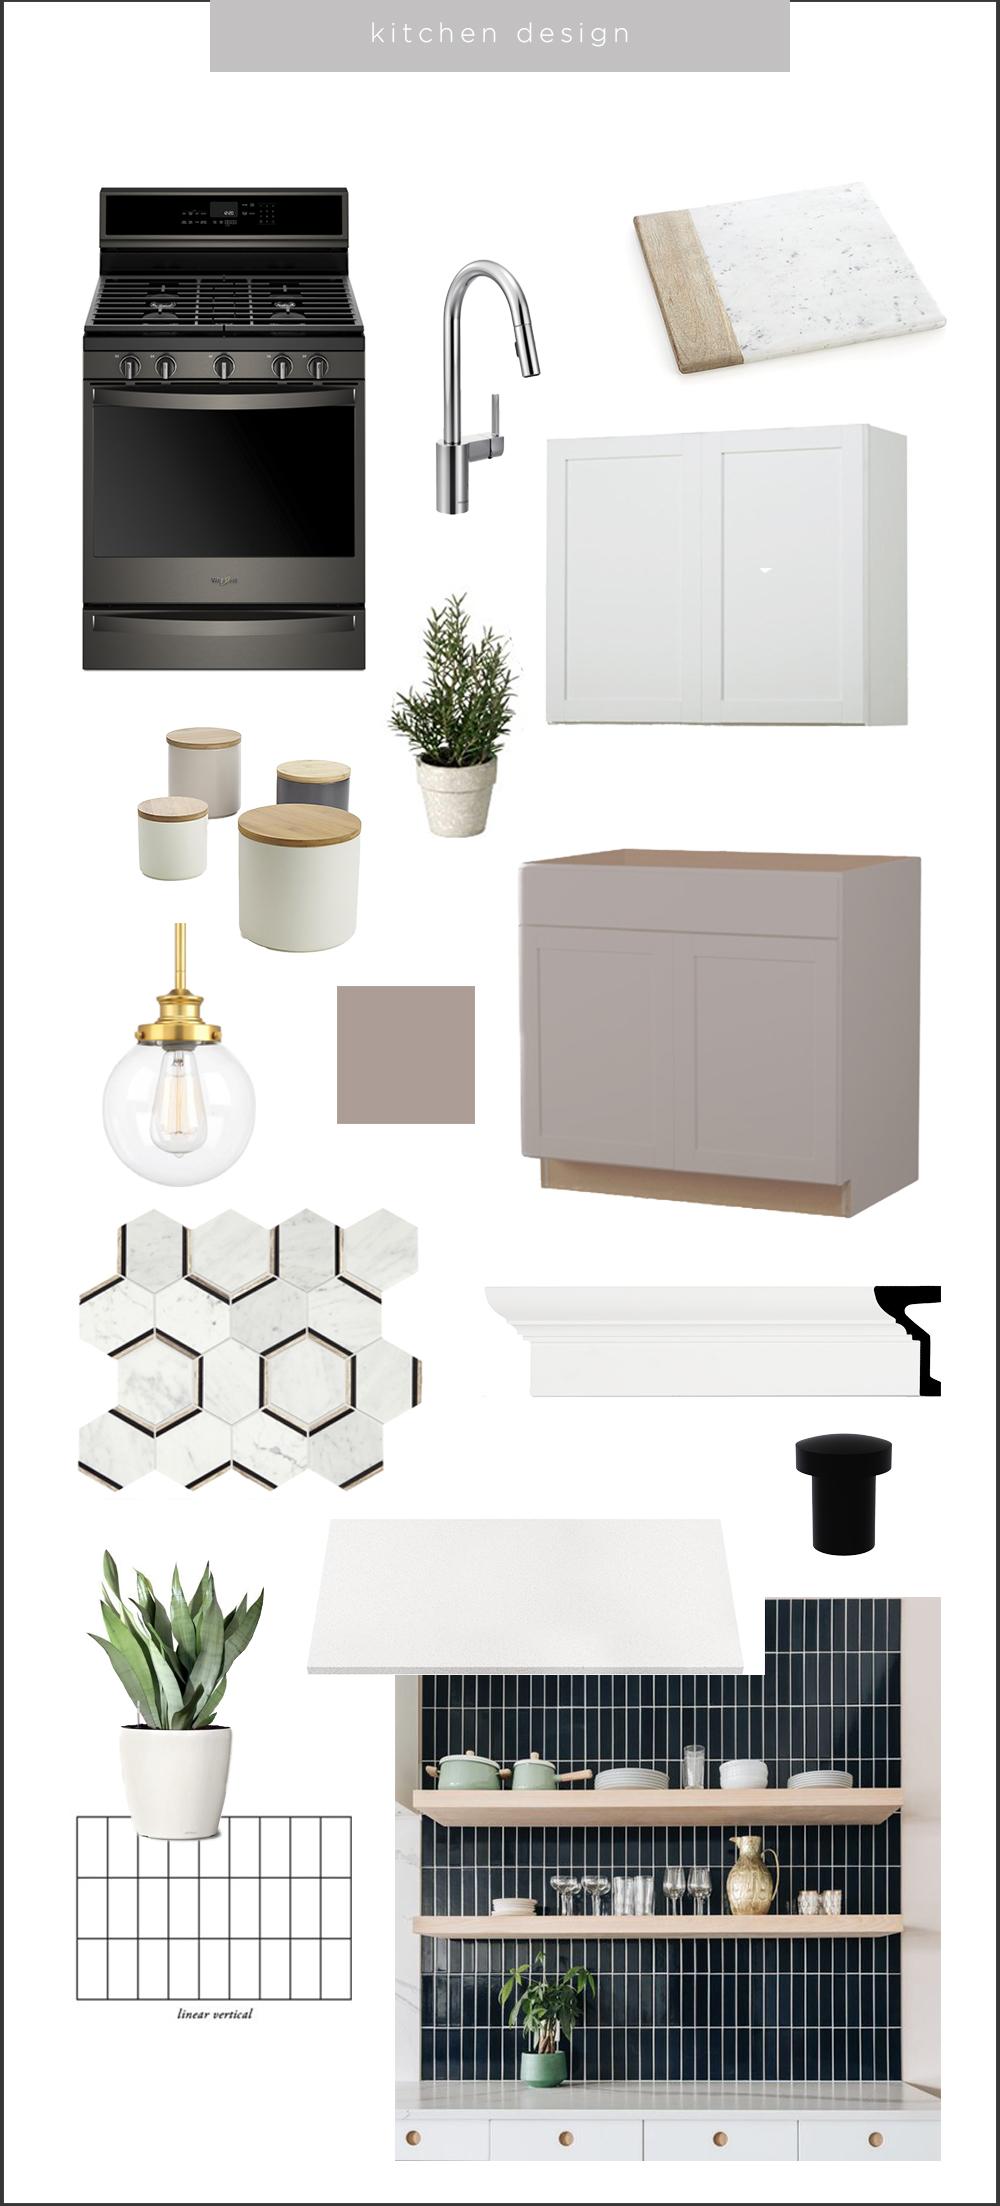 kitchendesign2.jpg